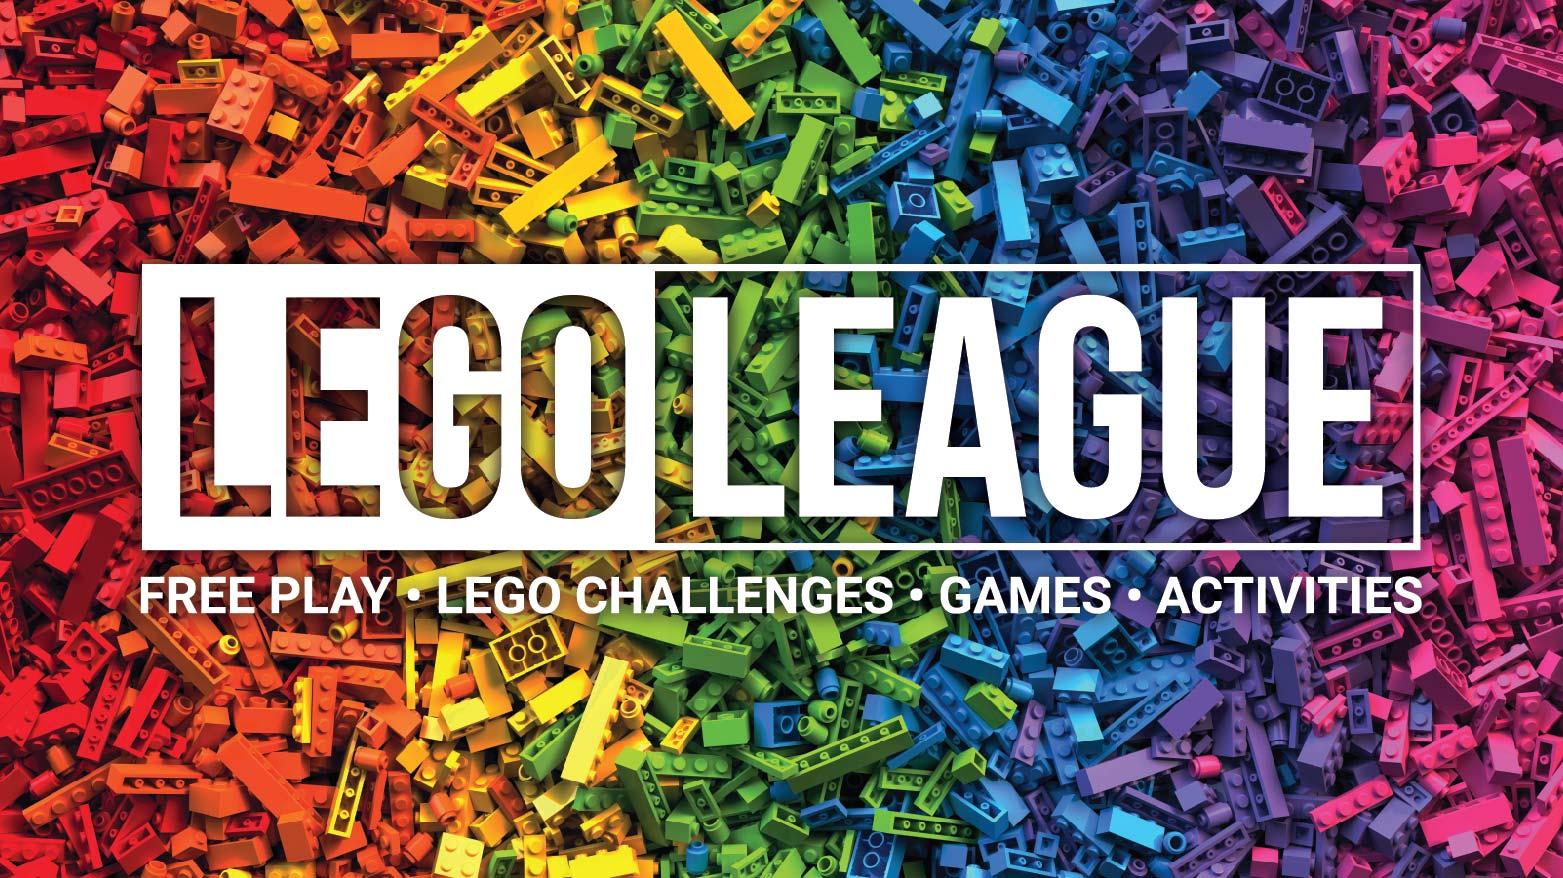 Lego League - CANCELLED